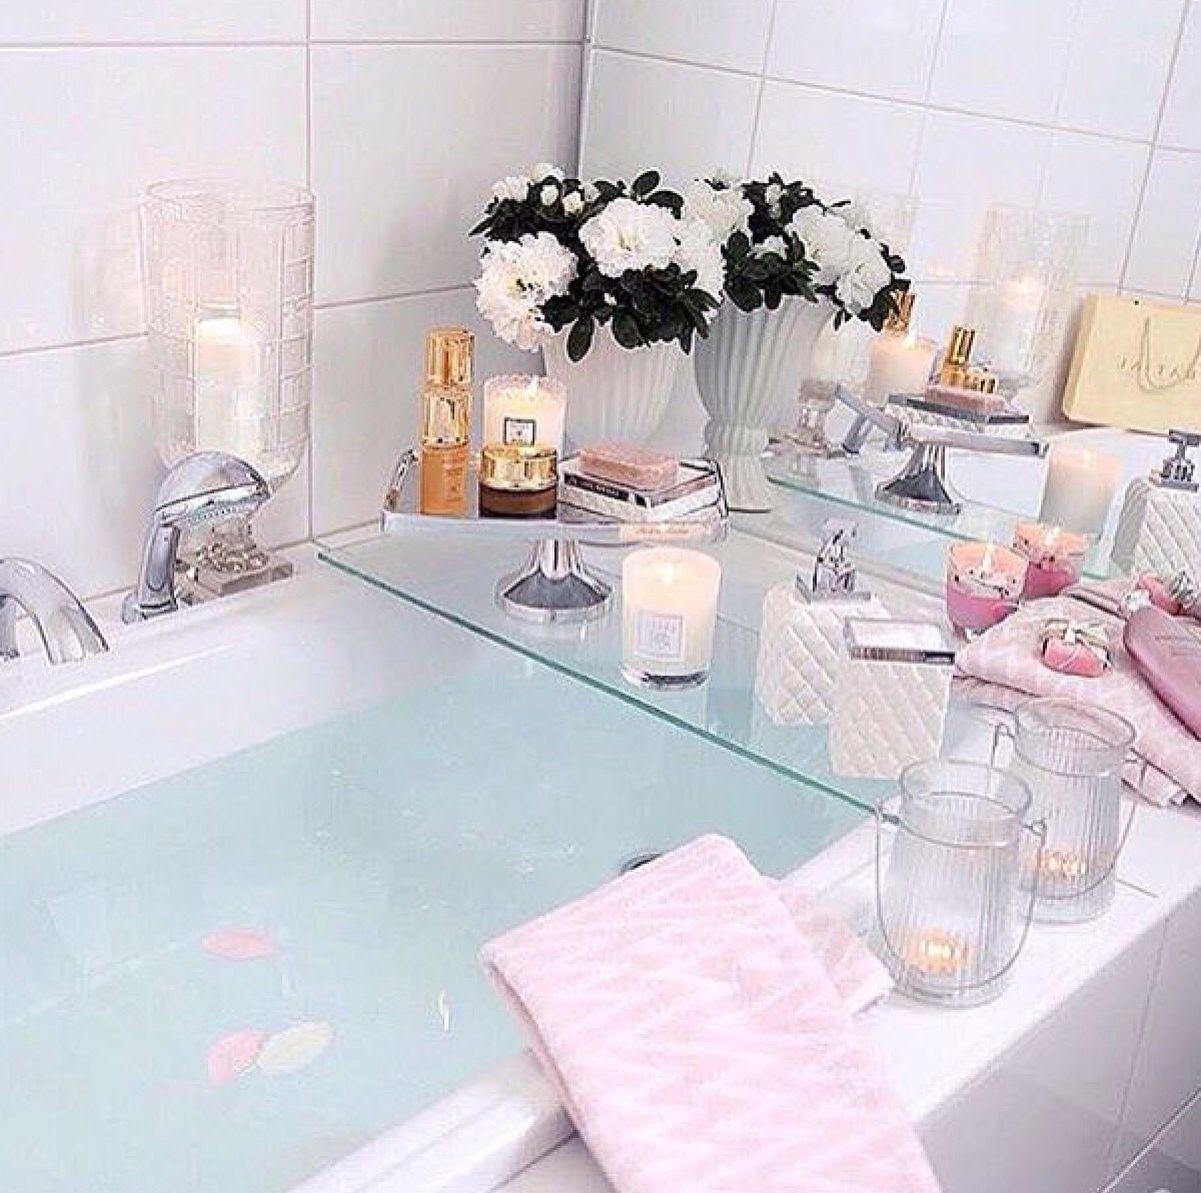 Glass Bath Tray | SO DAMN CUTE! | Pinterest | Trays, Bath and ...